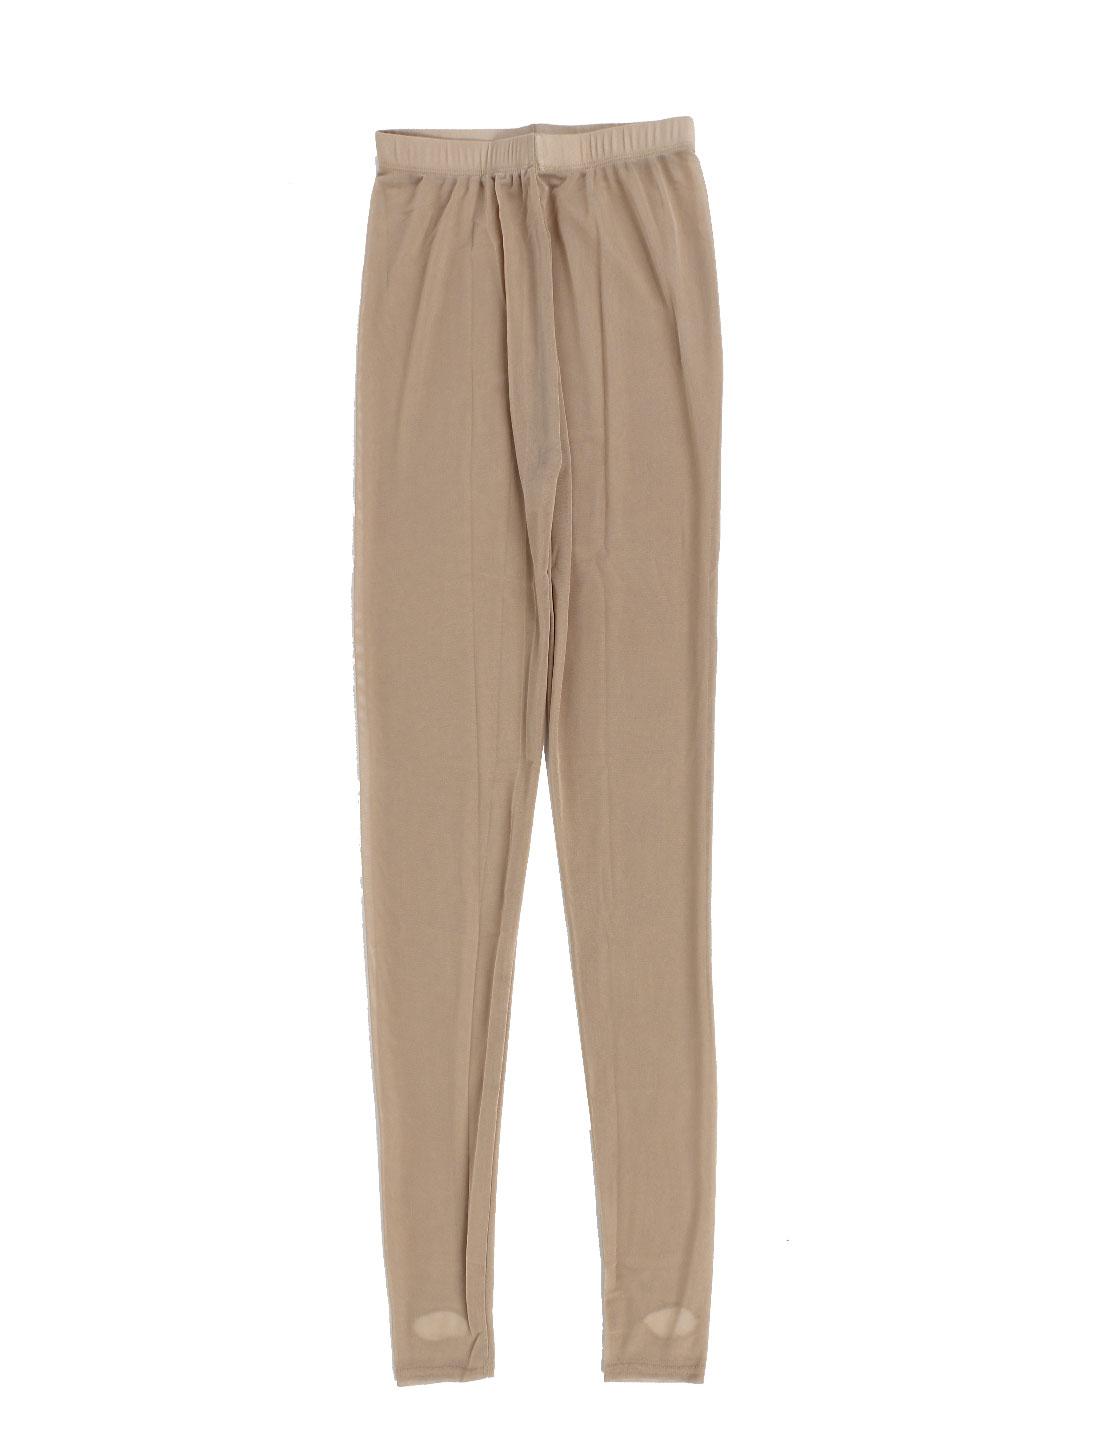 Lady Solid Color Leggings Mesh Elastic Stirrup Pantyhose Stockings US 0